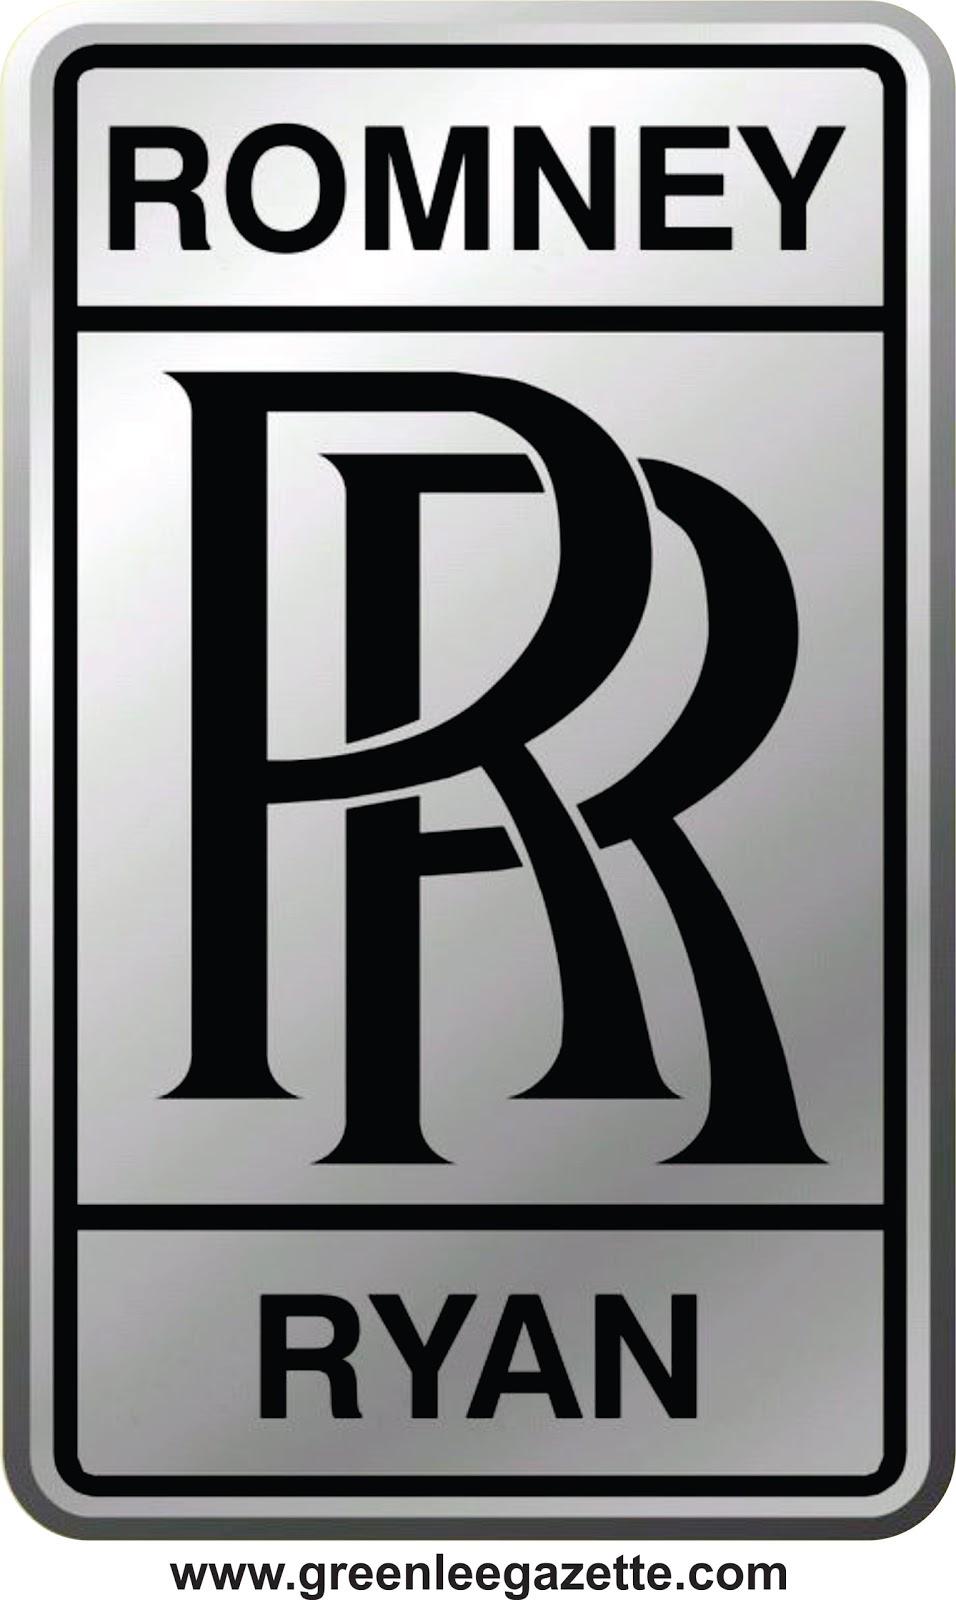 rolls royce logo romney ryan wwwpixsharkcom images